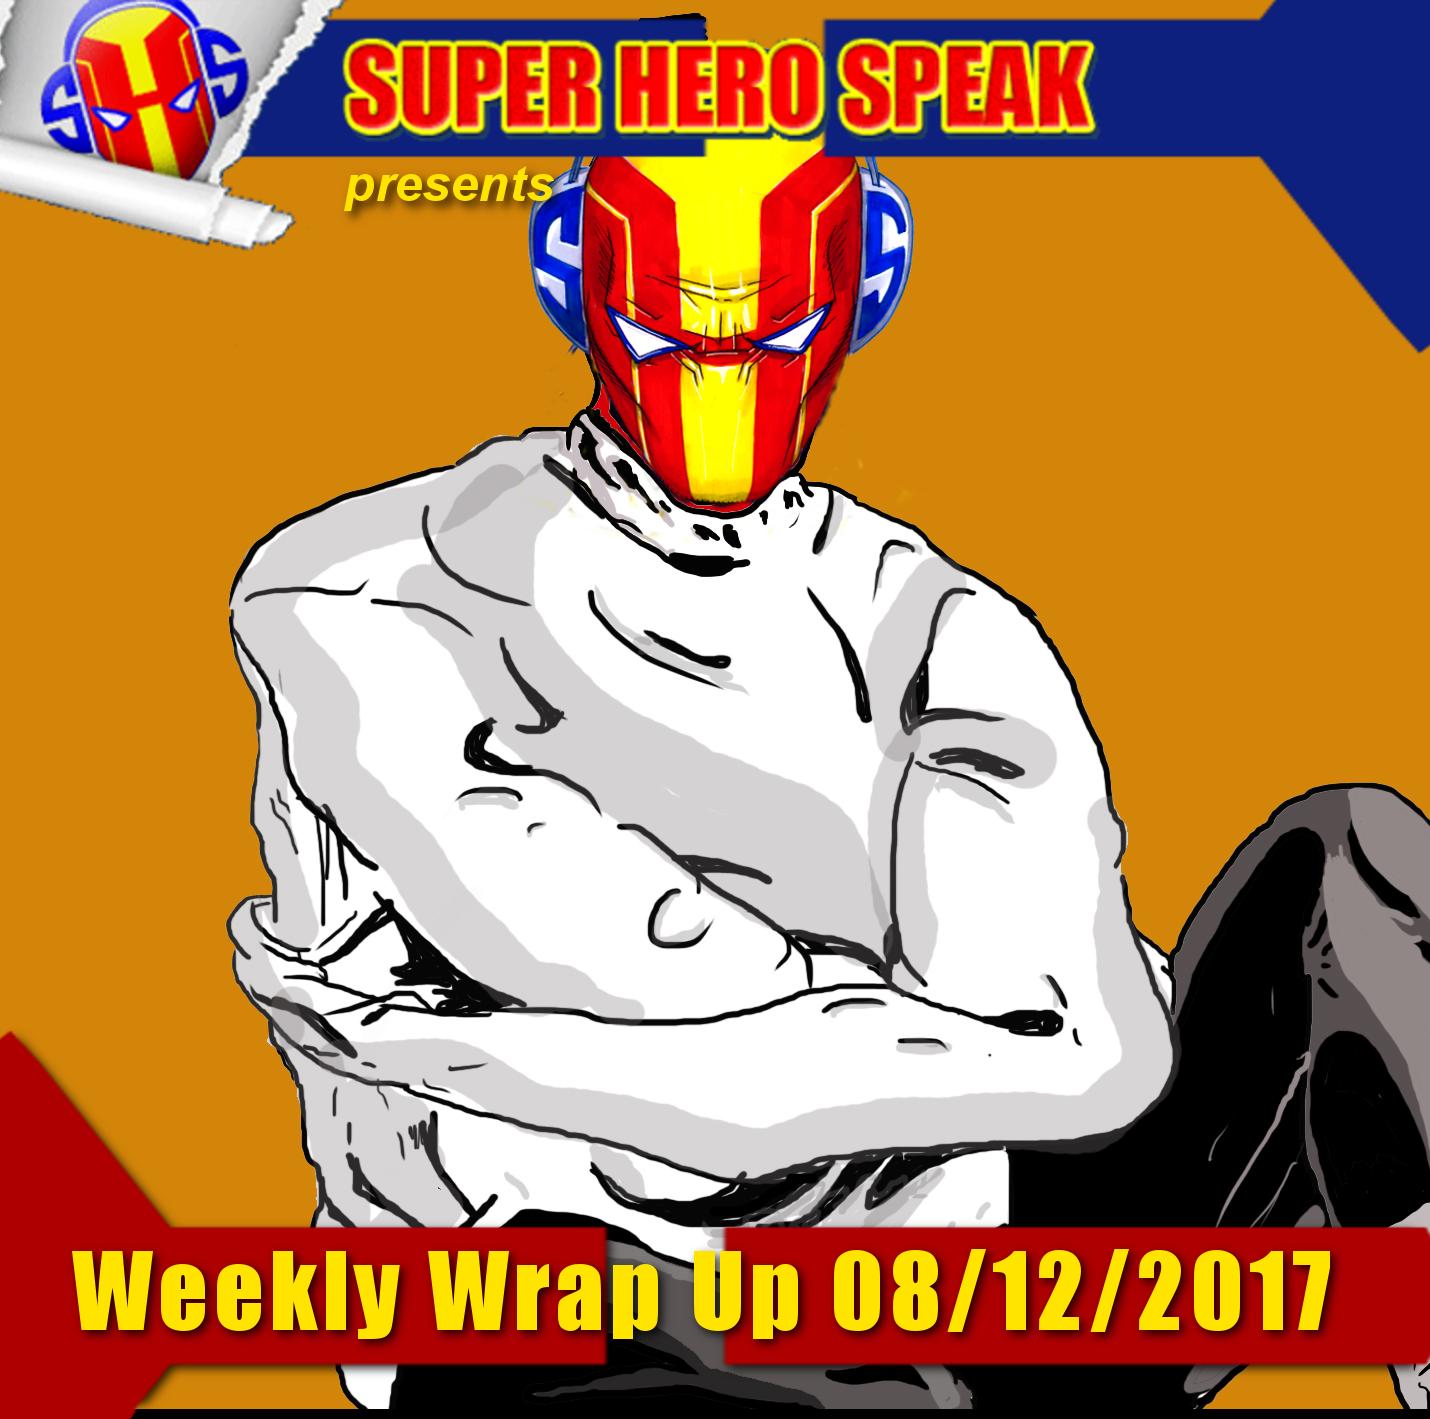 SHS Weekly Wrap Up 08/12/2017